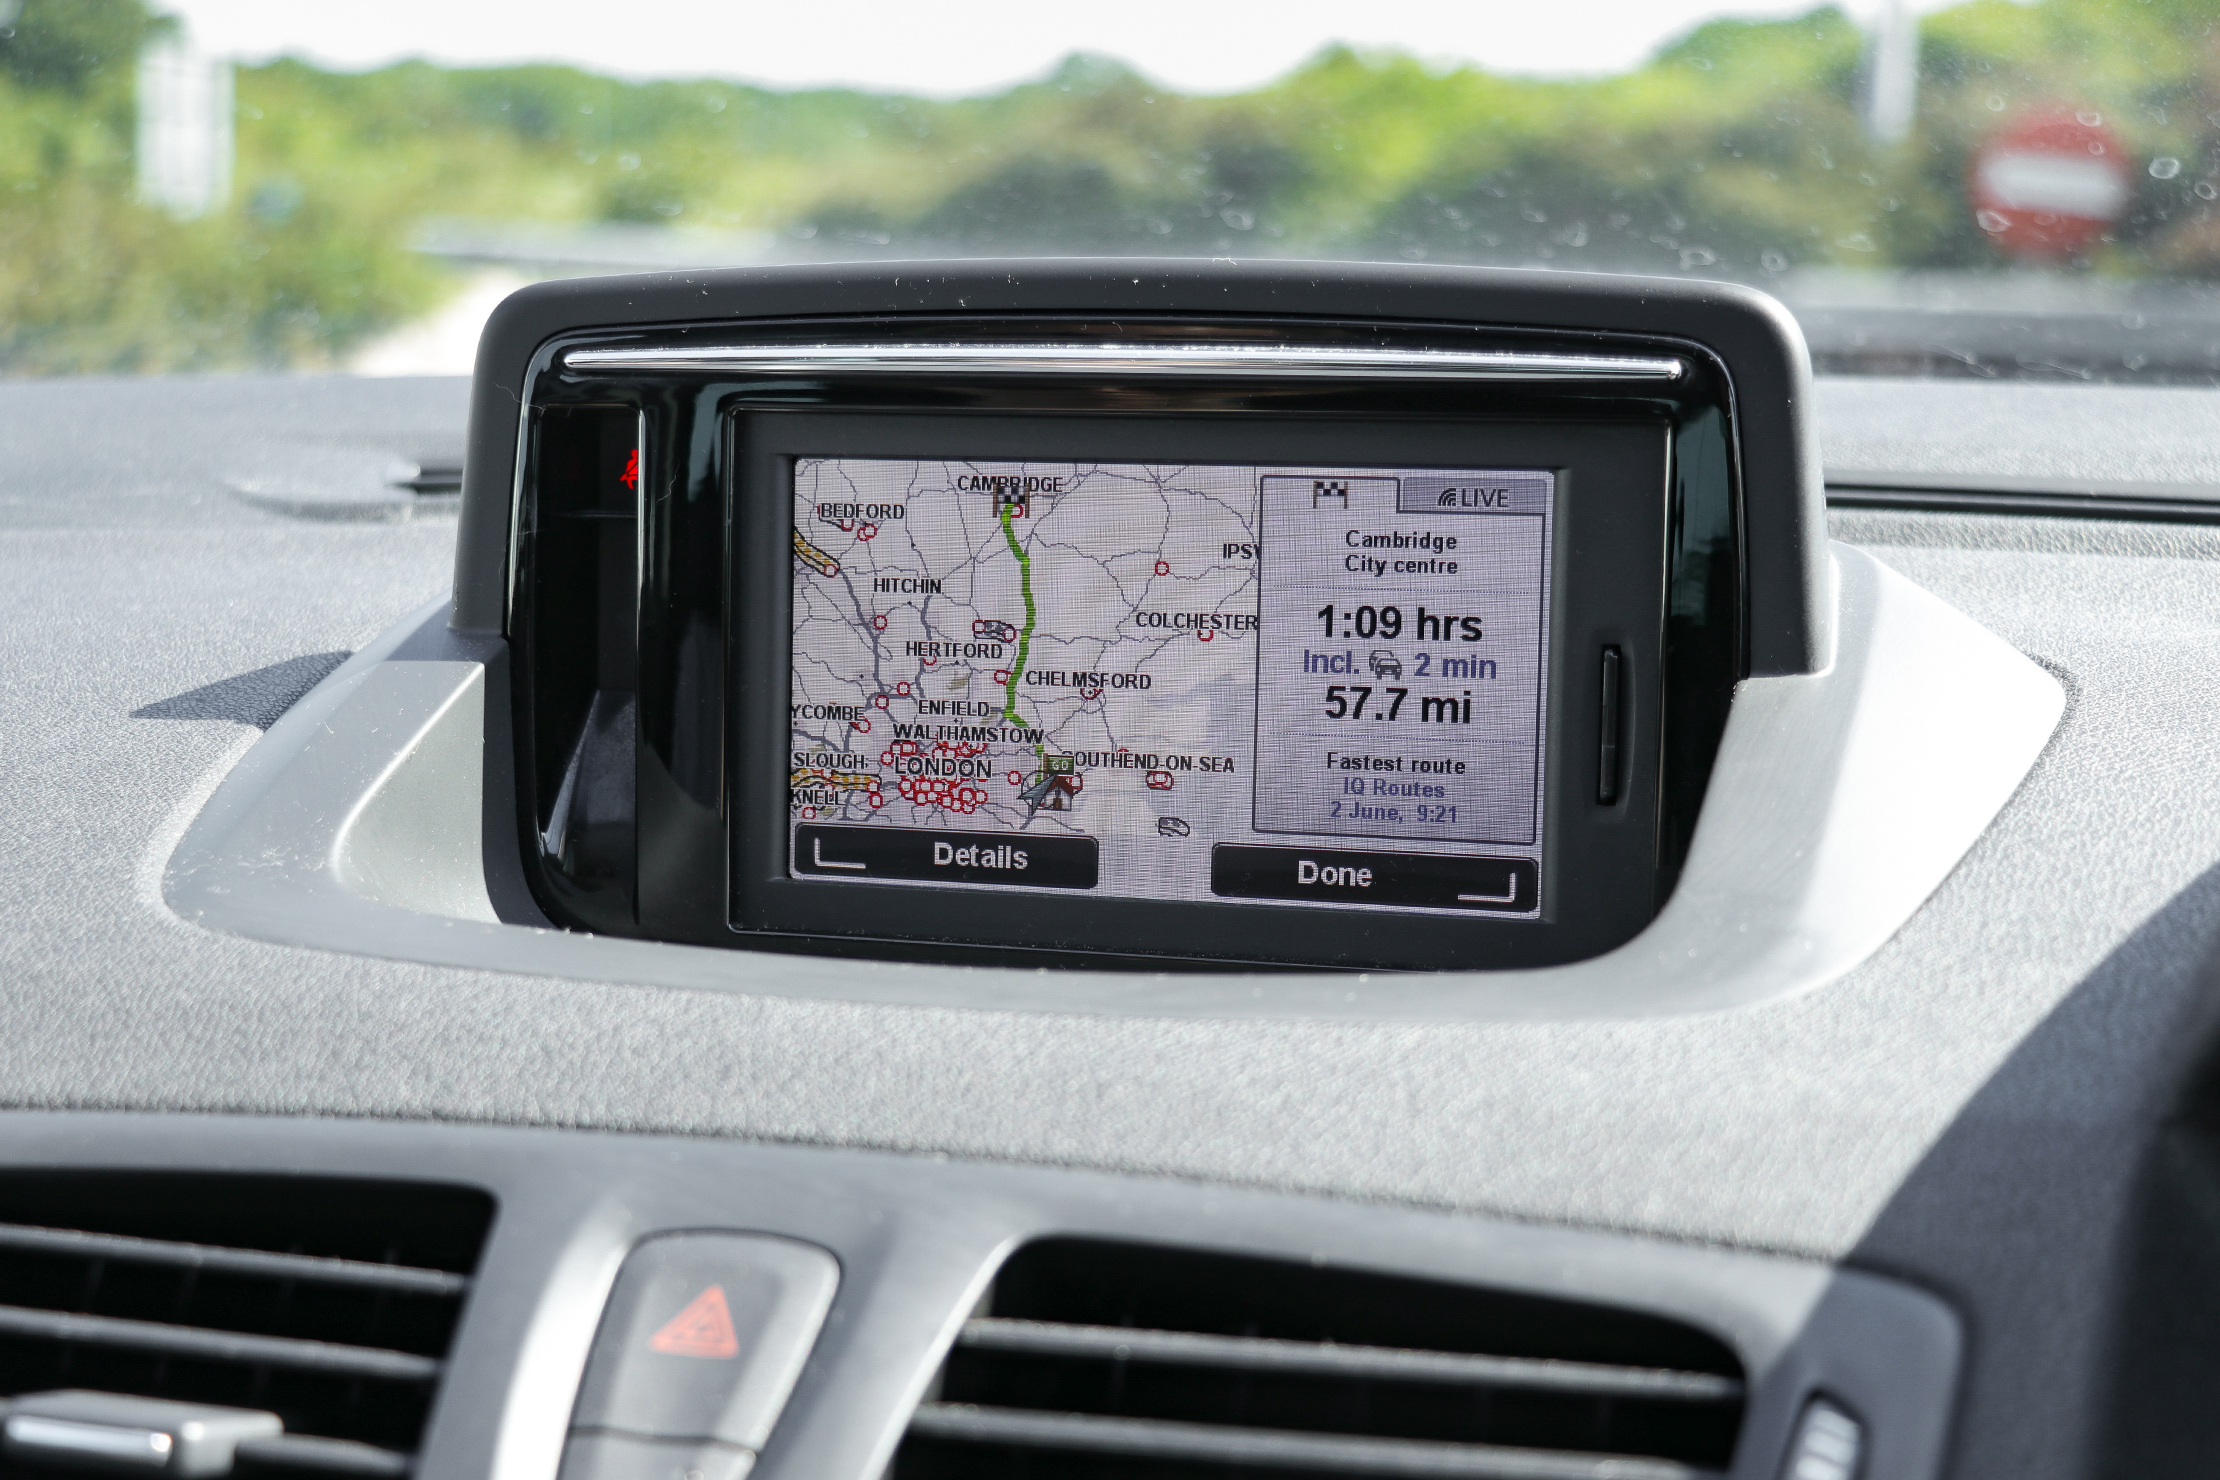 Car Navigation Road Trip Guide